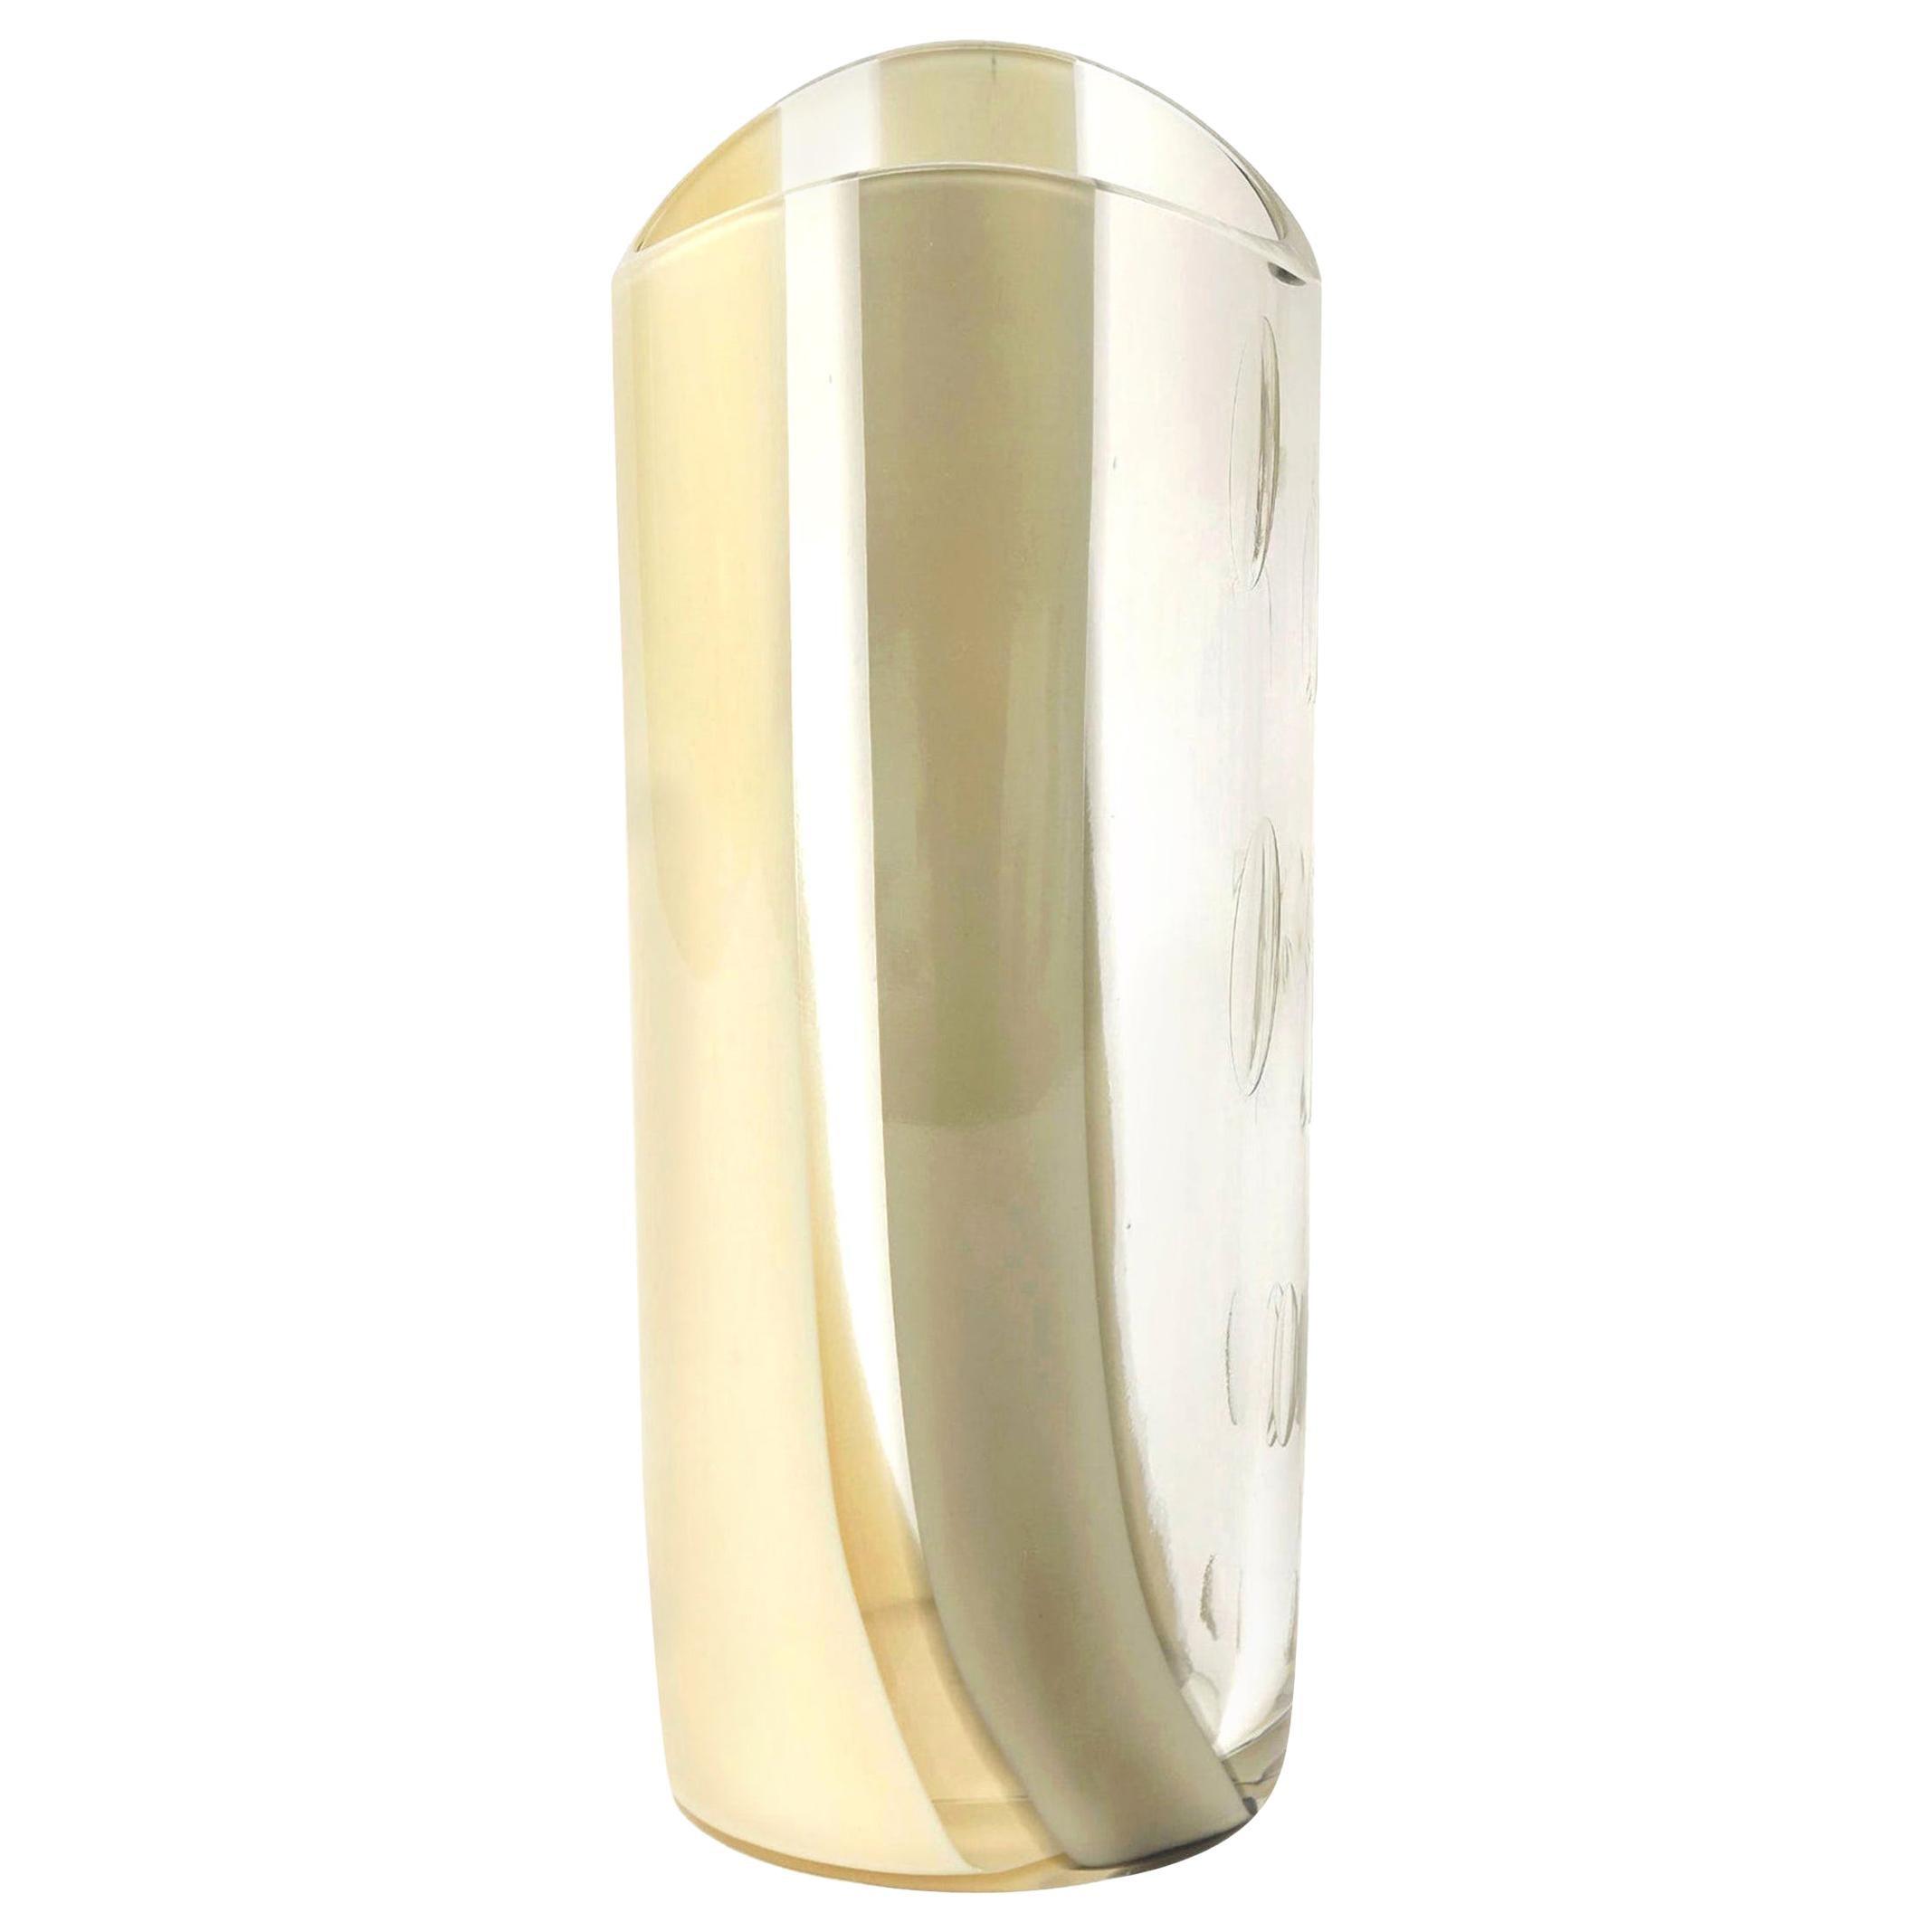 Seguso Vetri d'Arte Murano Abstract Glass Vase